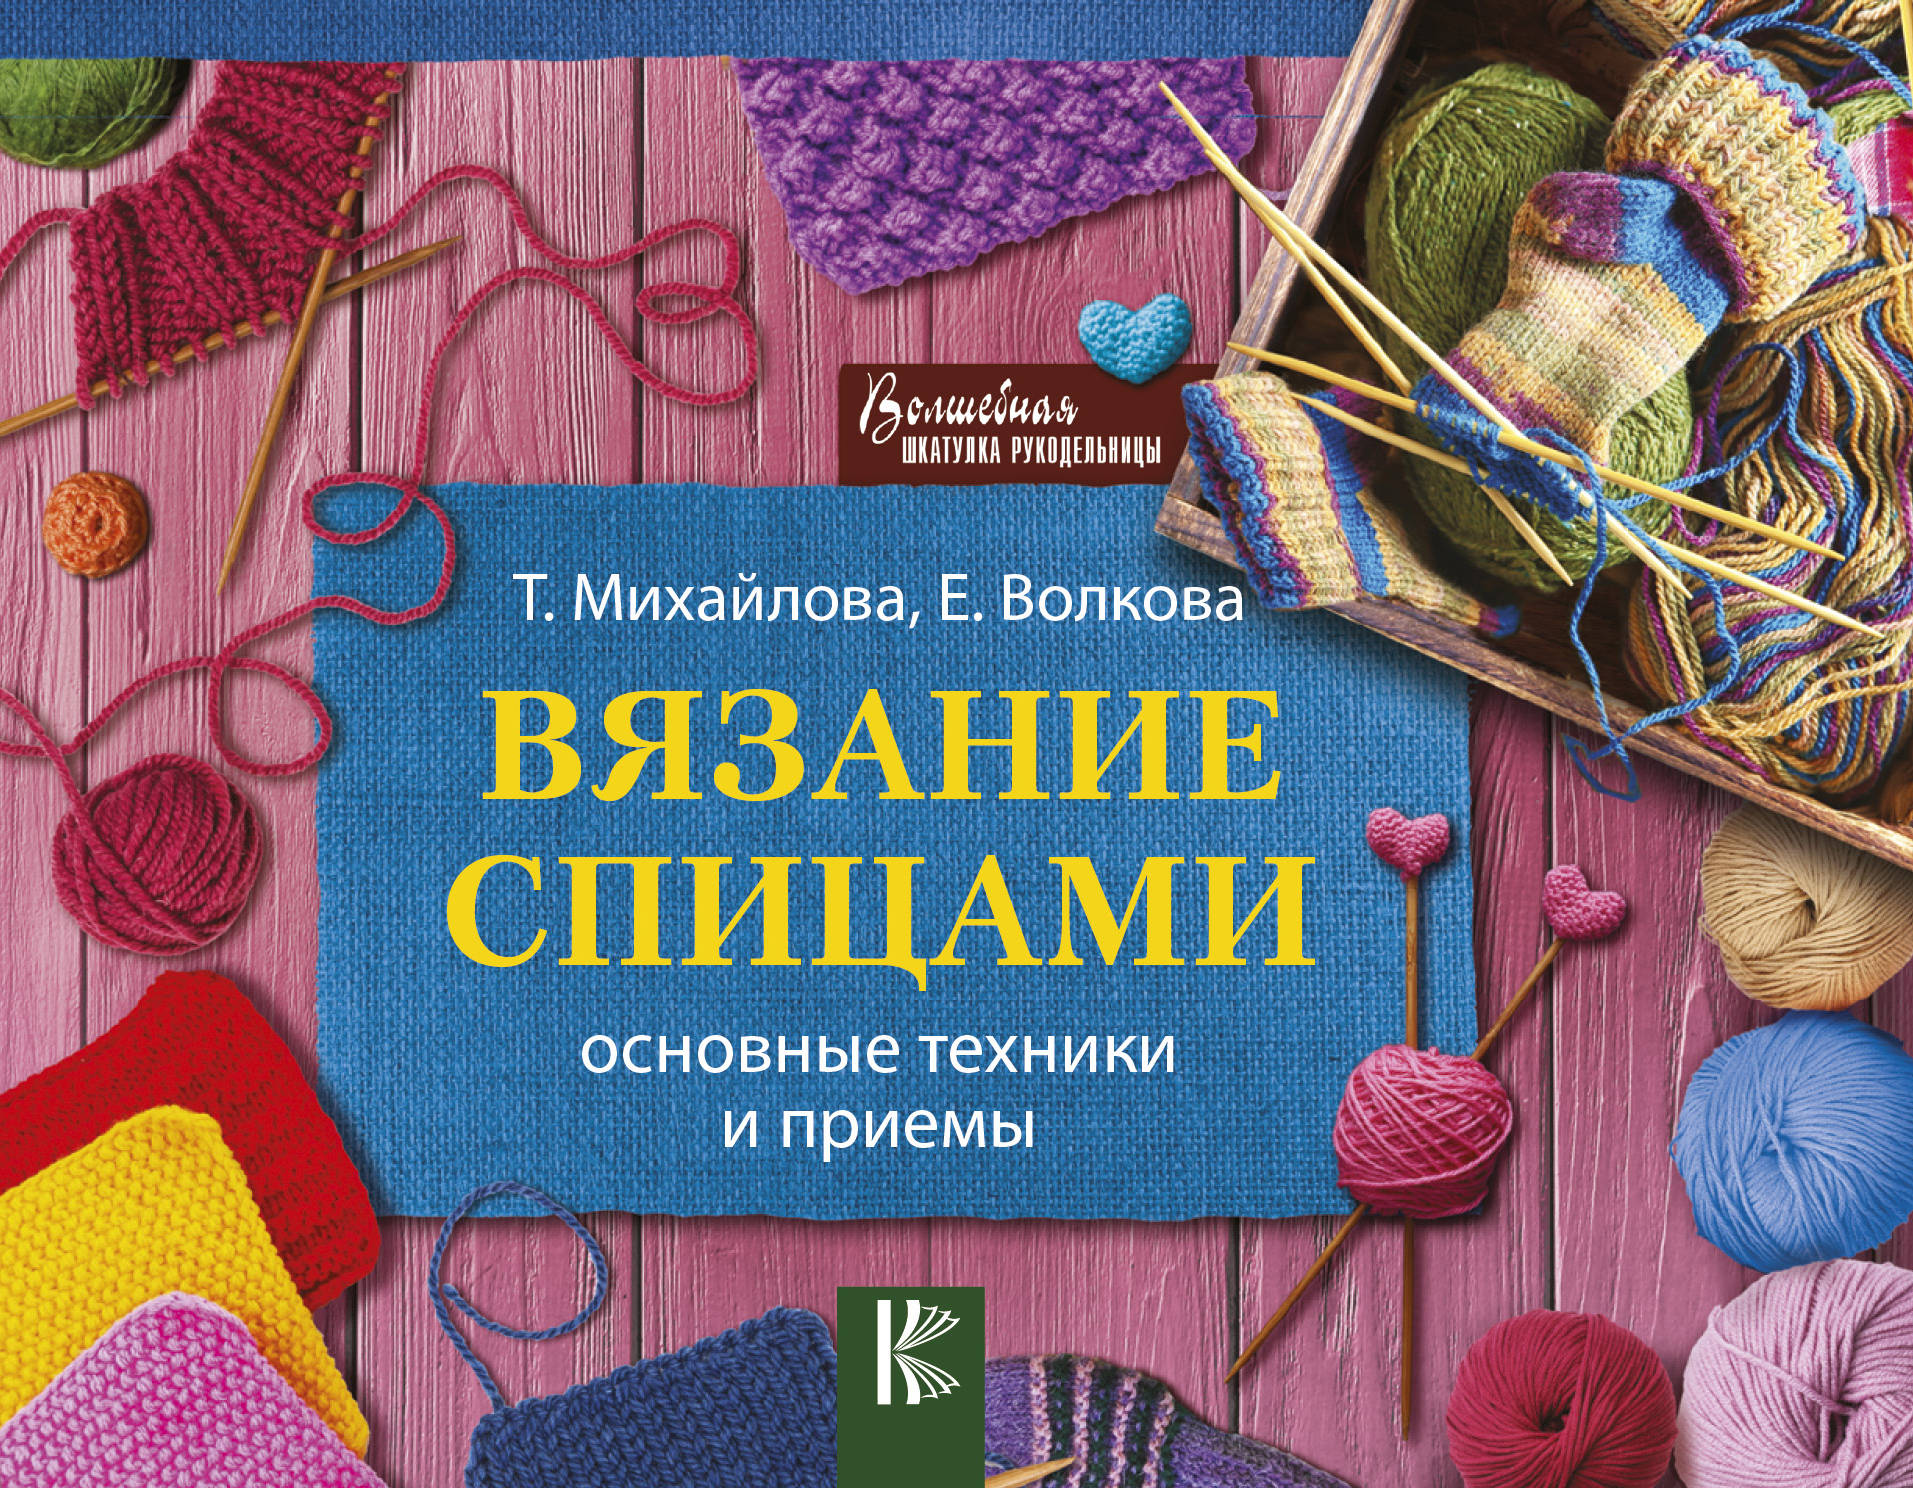 Е. Н. Волкова, Т. В. Михайлова Вязание спицами. Основные техники и приемы